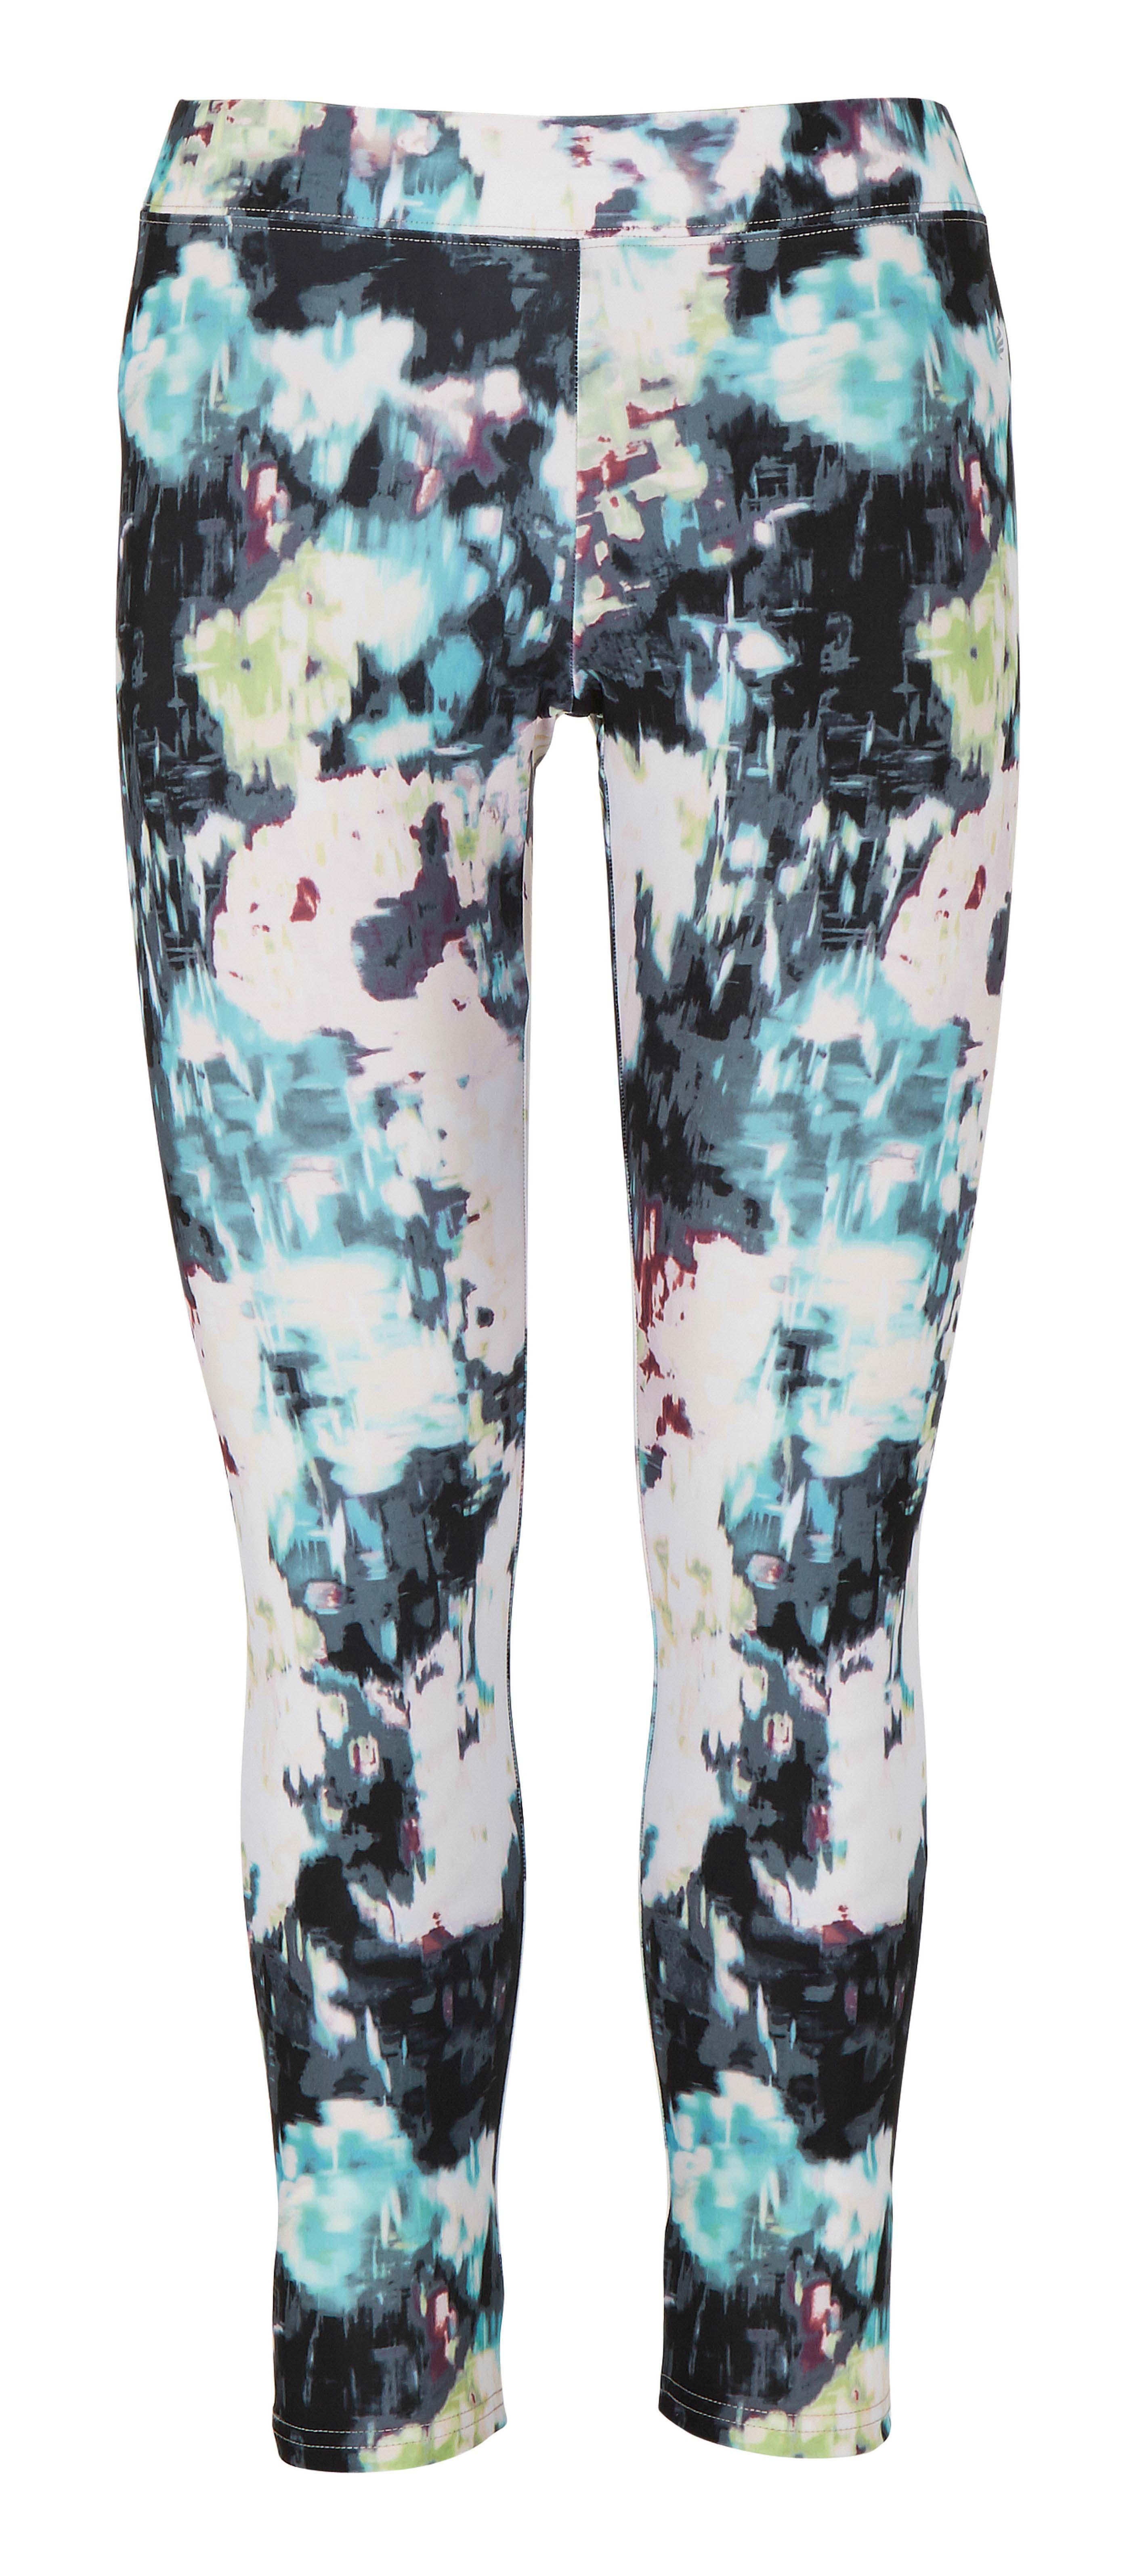 6064831 Superfit SP1516 Printed 7-8 Legging $69.99 Instore Feb 08 2016